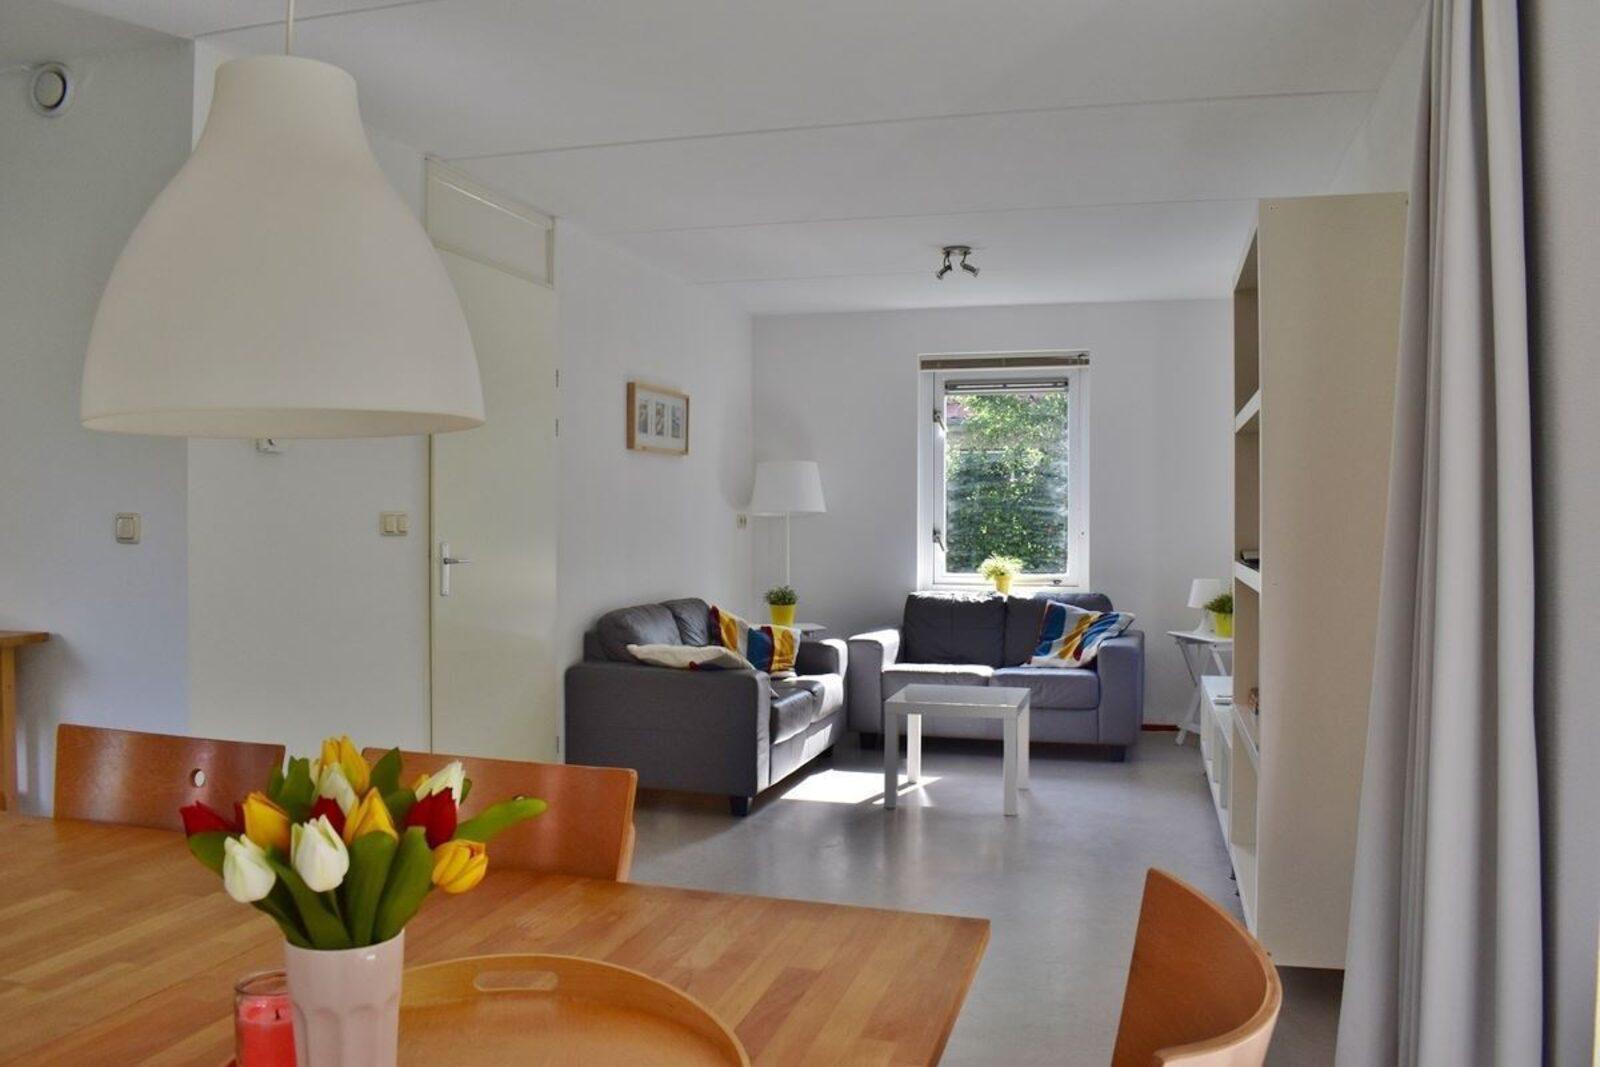 Ferienhaus - Zuidweg 18 | Zonnemaire 'Park Viletta huisje 28'